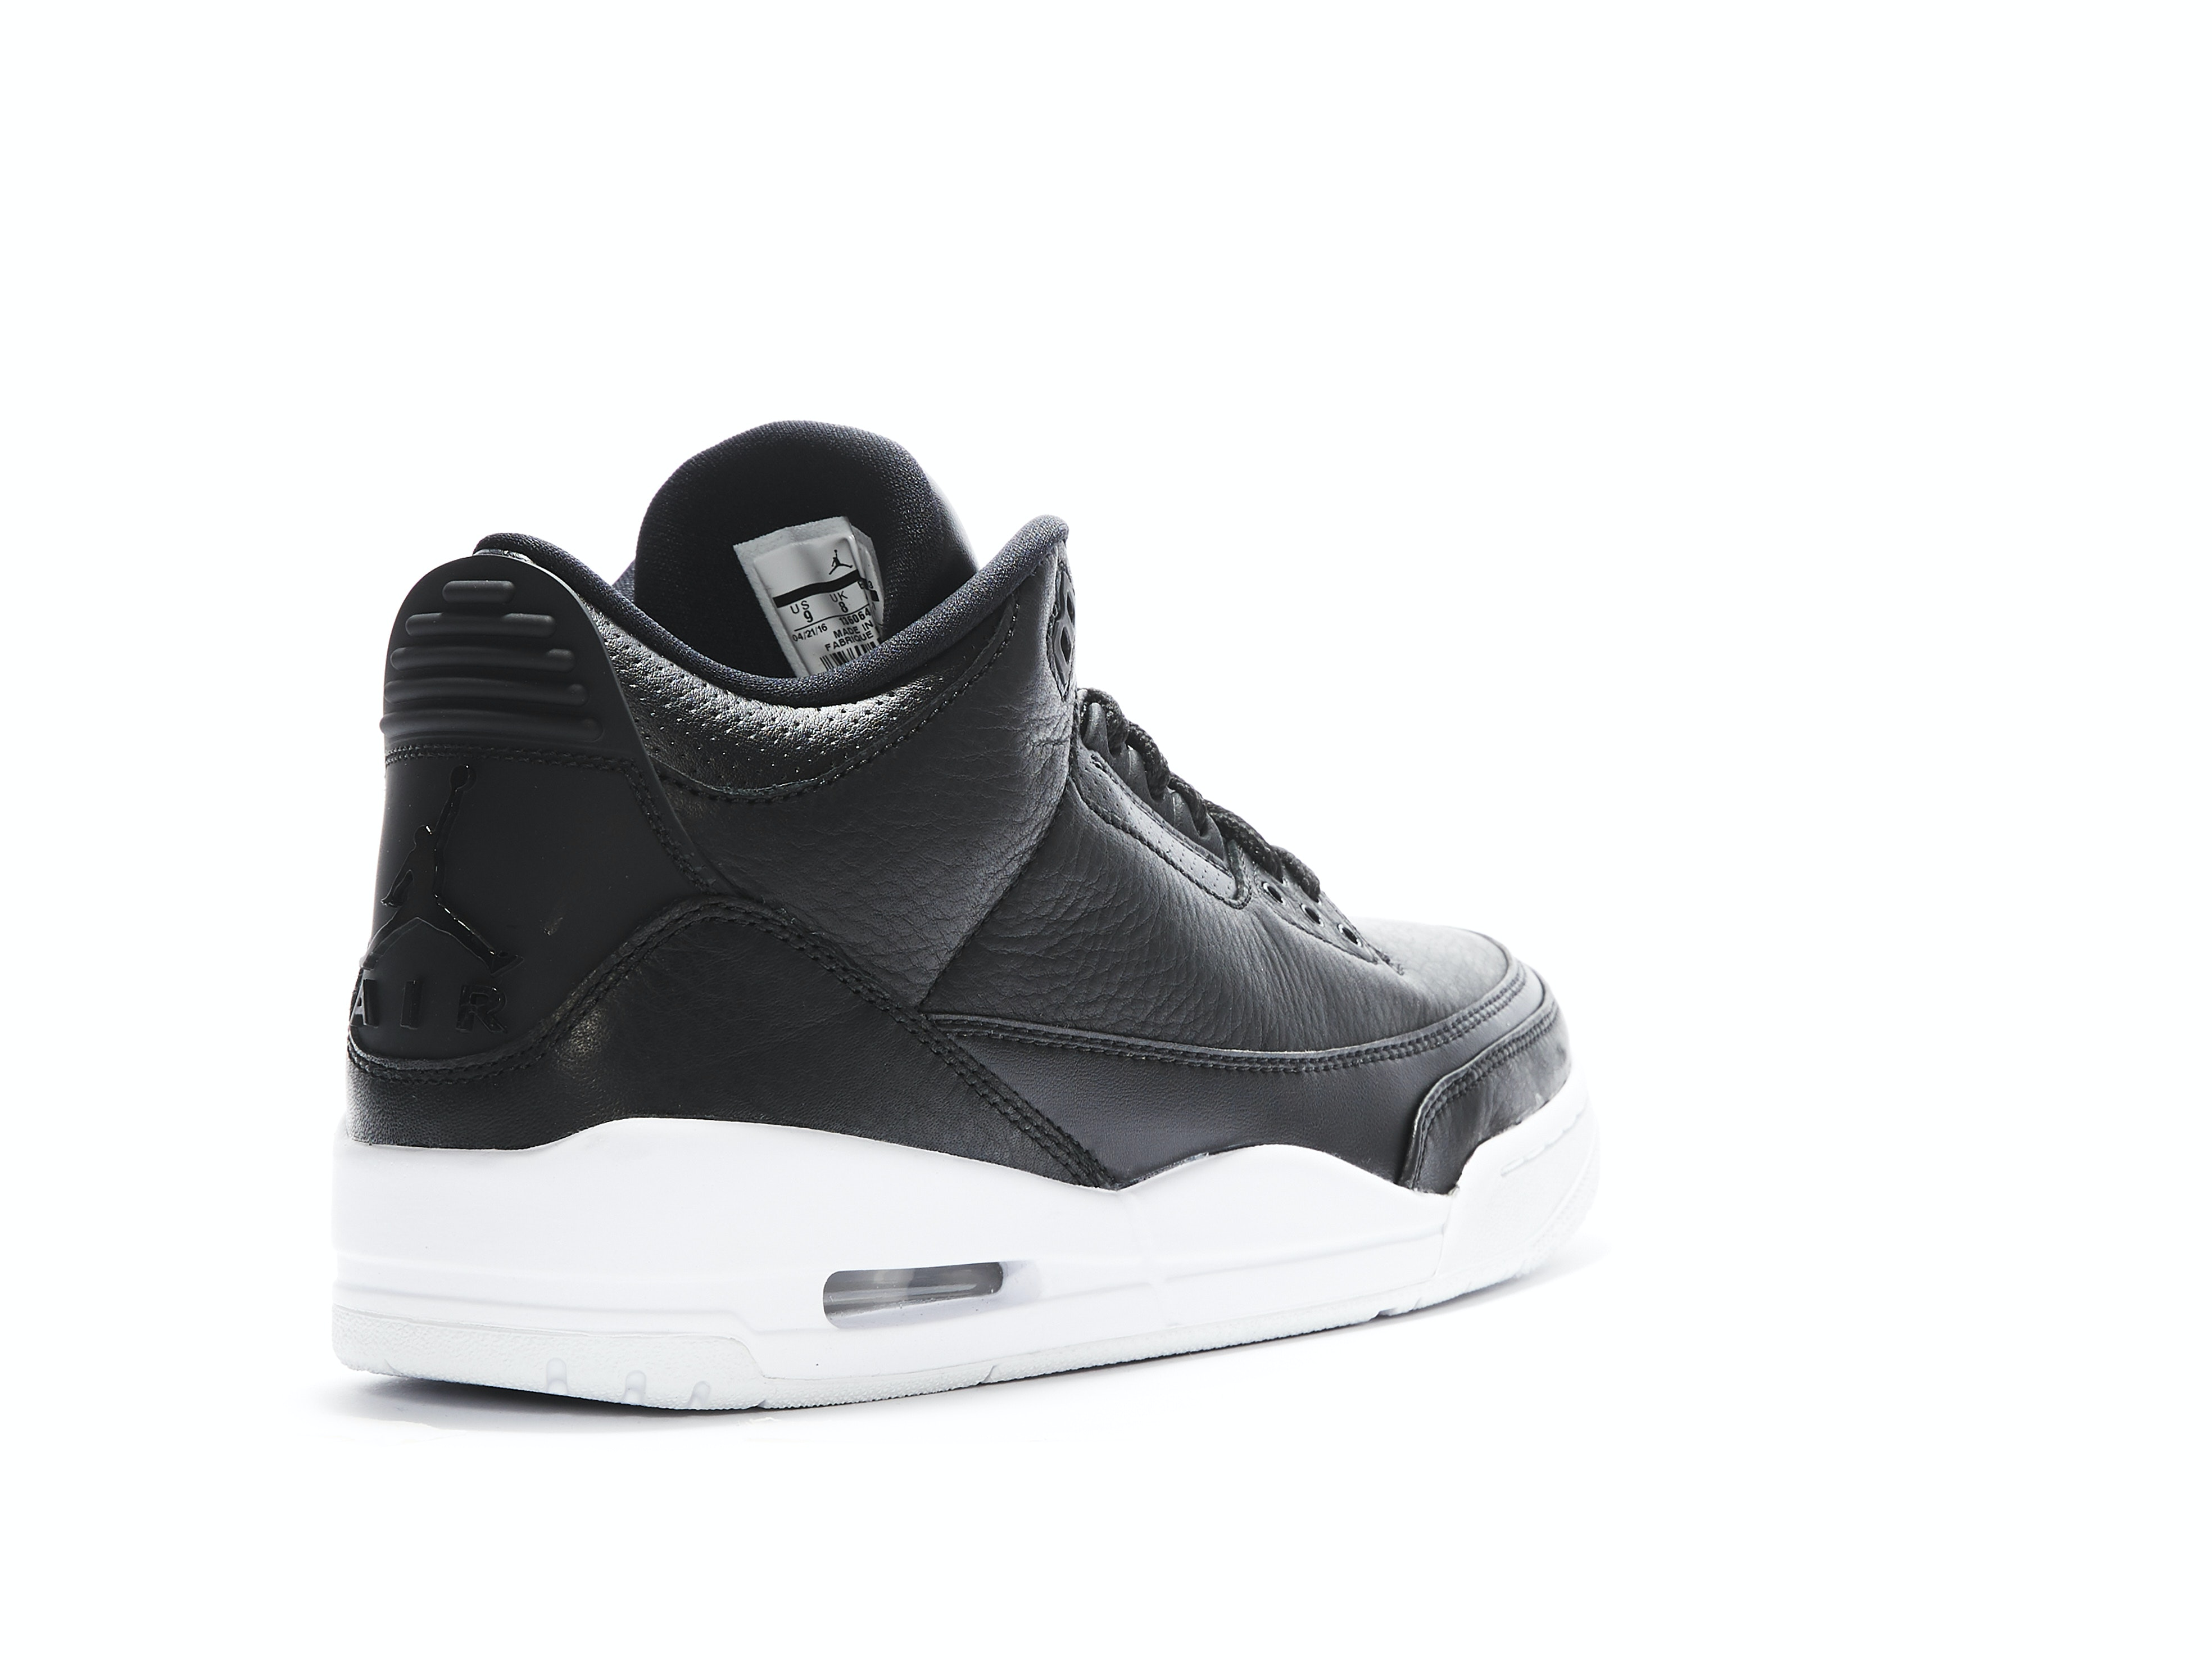 464c3e8bac77ef Shop Air Jordan 3 Retro Cyber Monday Online